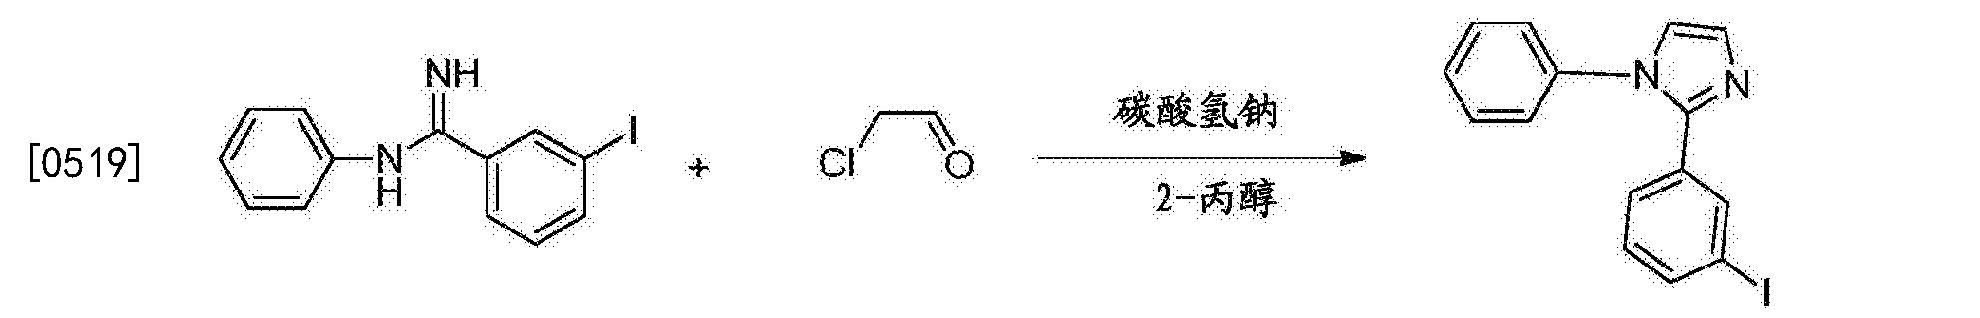 Figure CN106749425AD01551